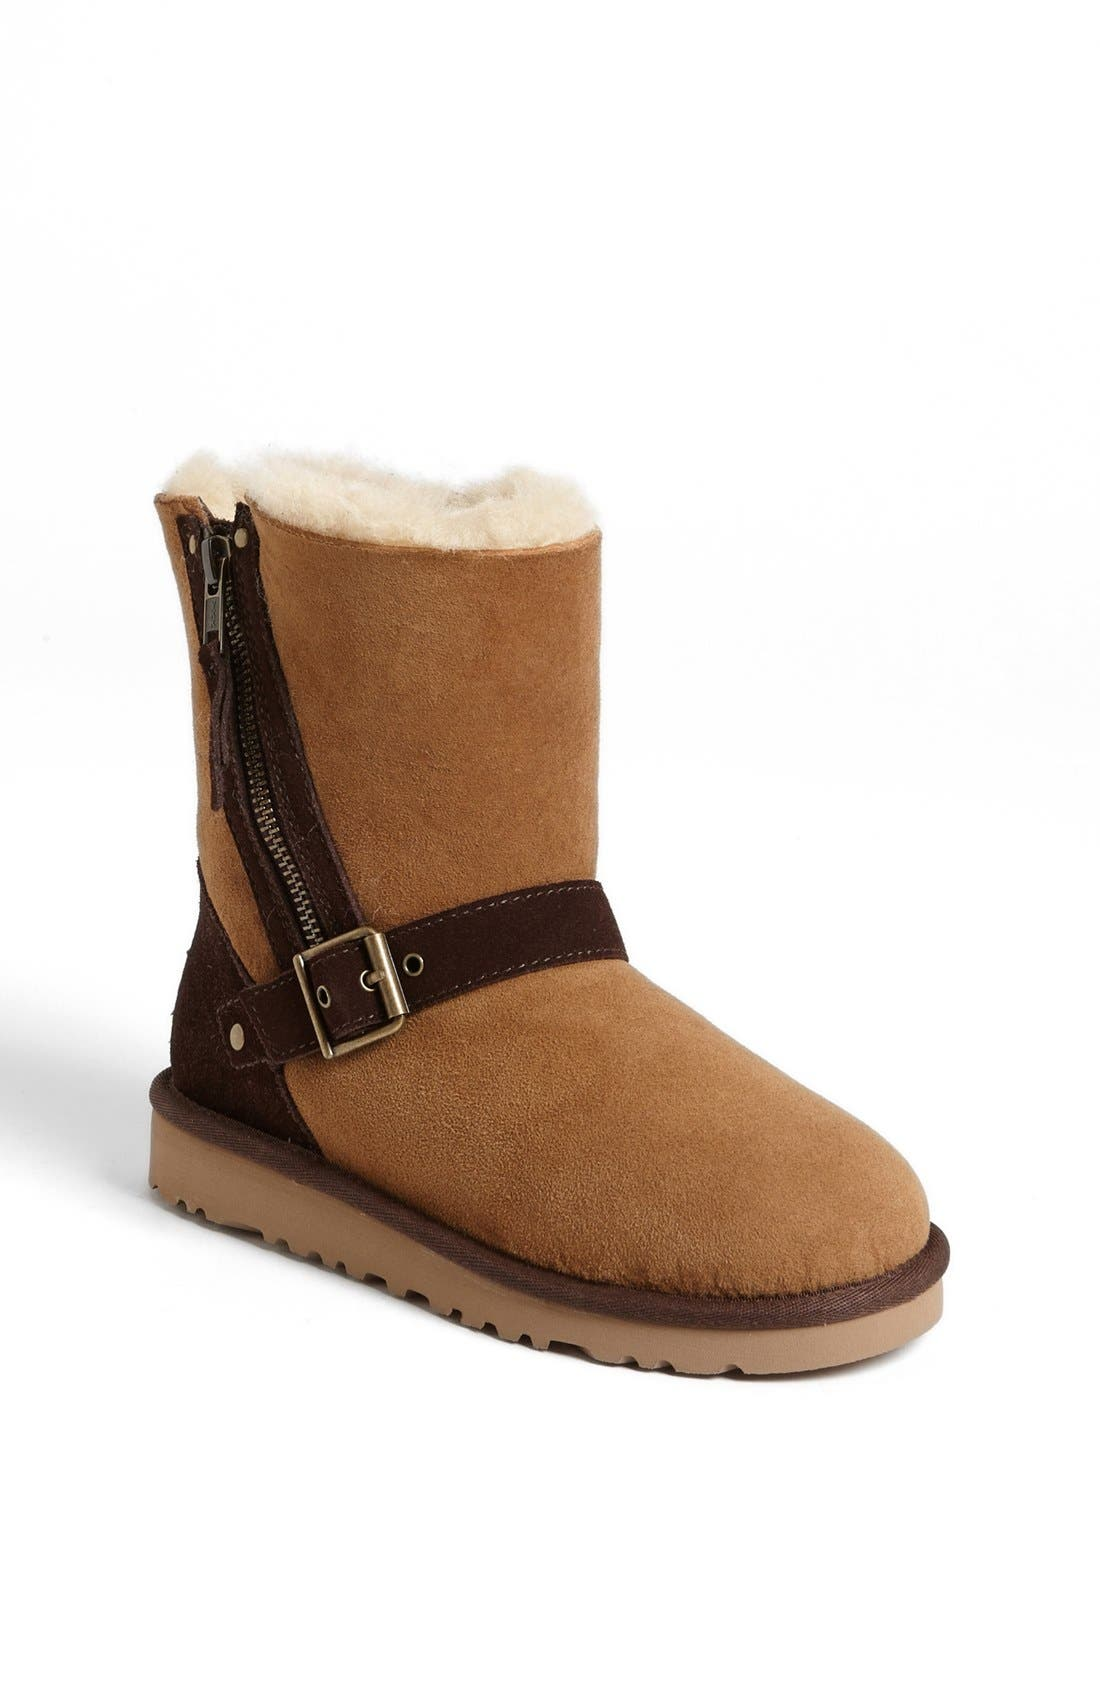 Alternate Image 1 Selected - UGG® Australia 'Blaise' Boot (Toddler, Little Kid & Big Kid)